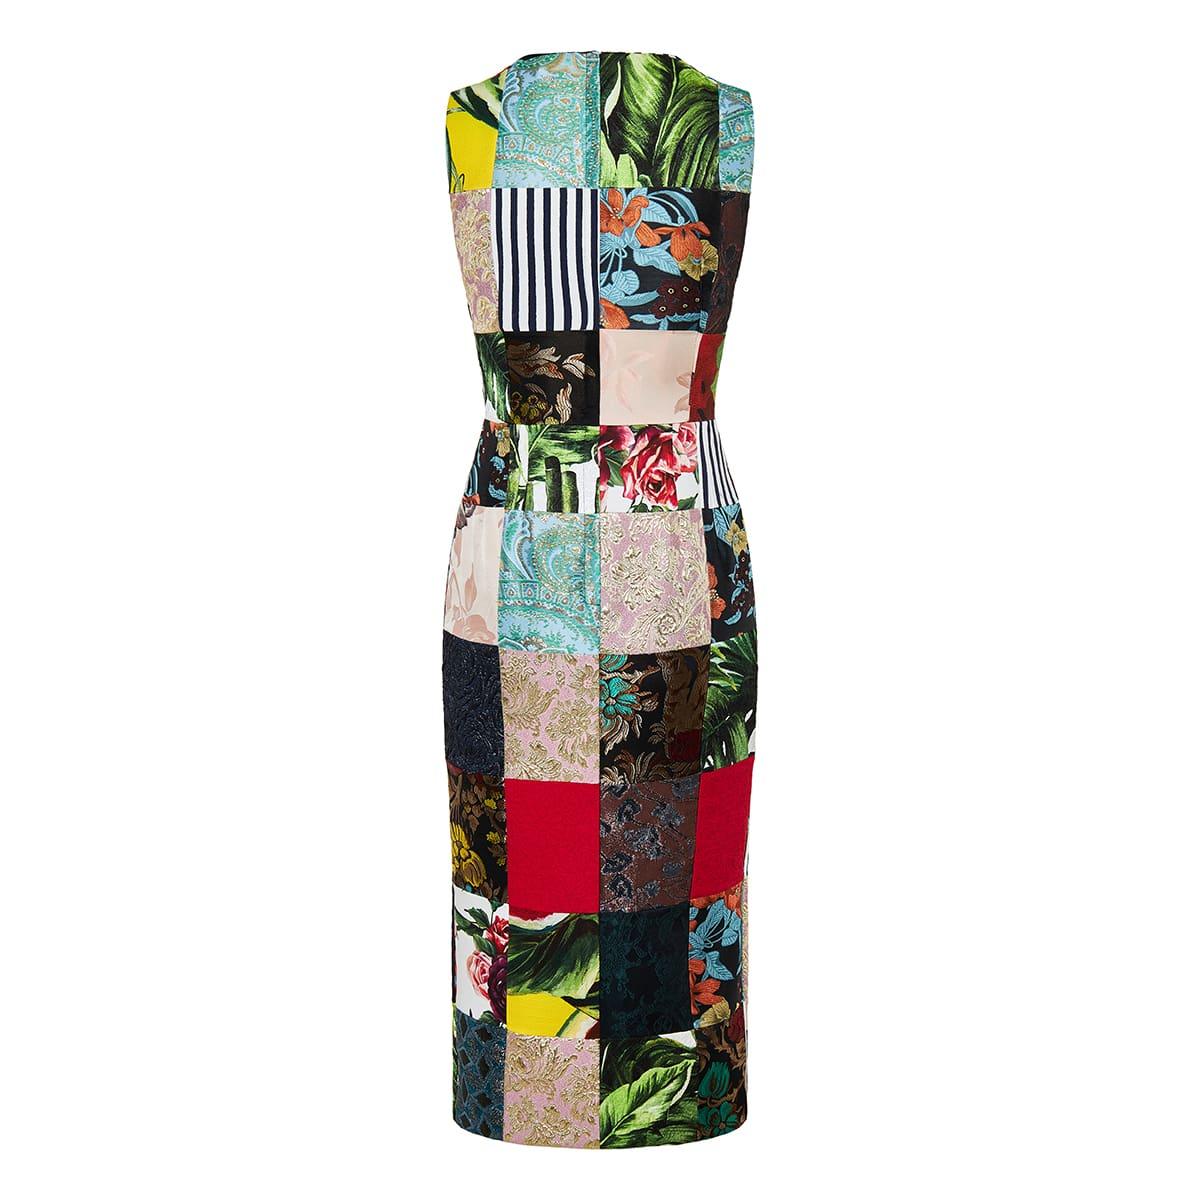 Patchwork brocade jacquard pencil dress